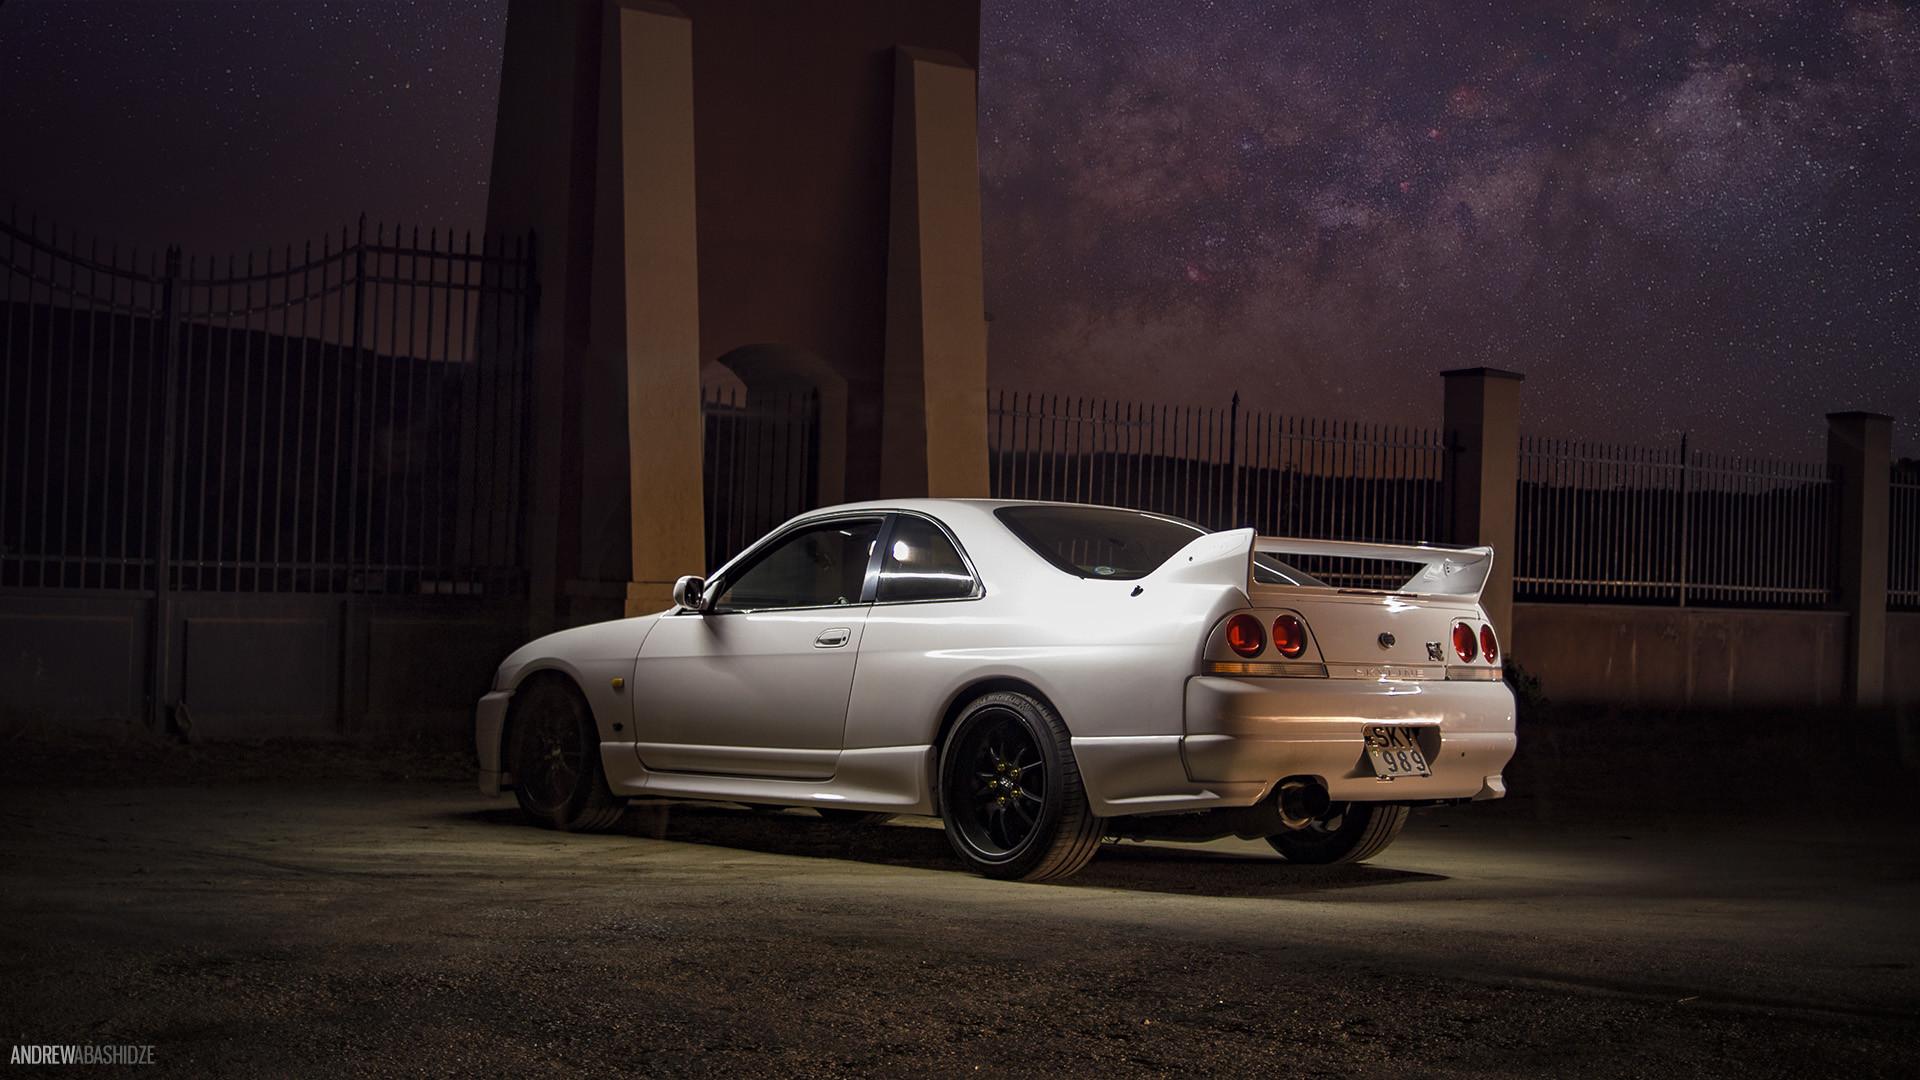 Exceptionnel 1920x1080 Nissan Skyline R33 GT R Wallpaper 1920x1080